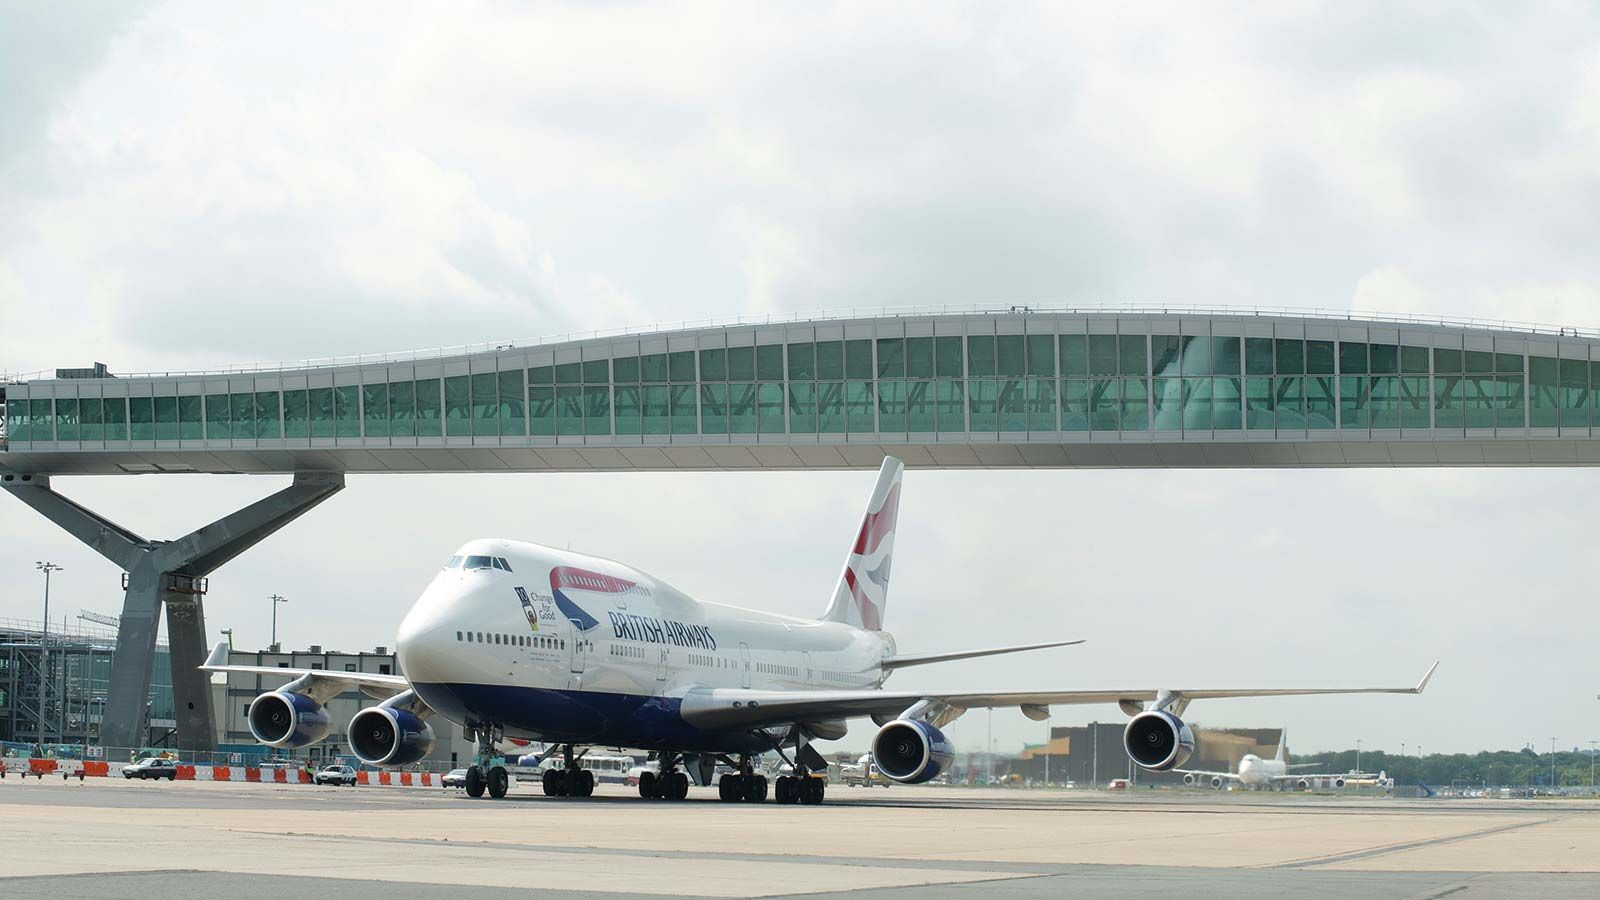 Gatwick Bridge, British Airways Plane - Mace Group